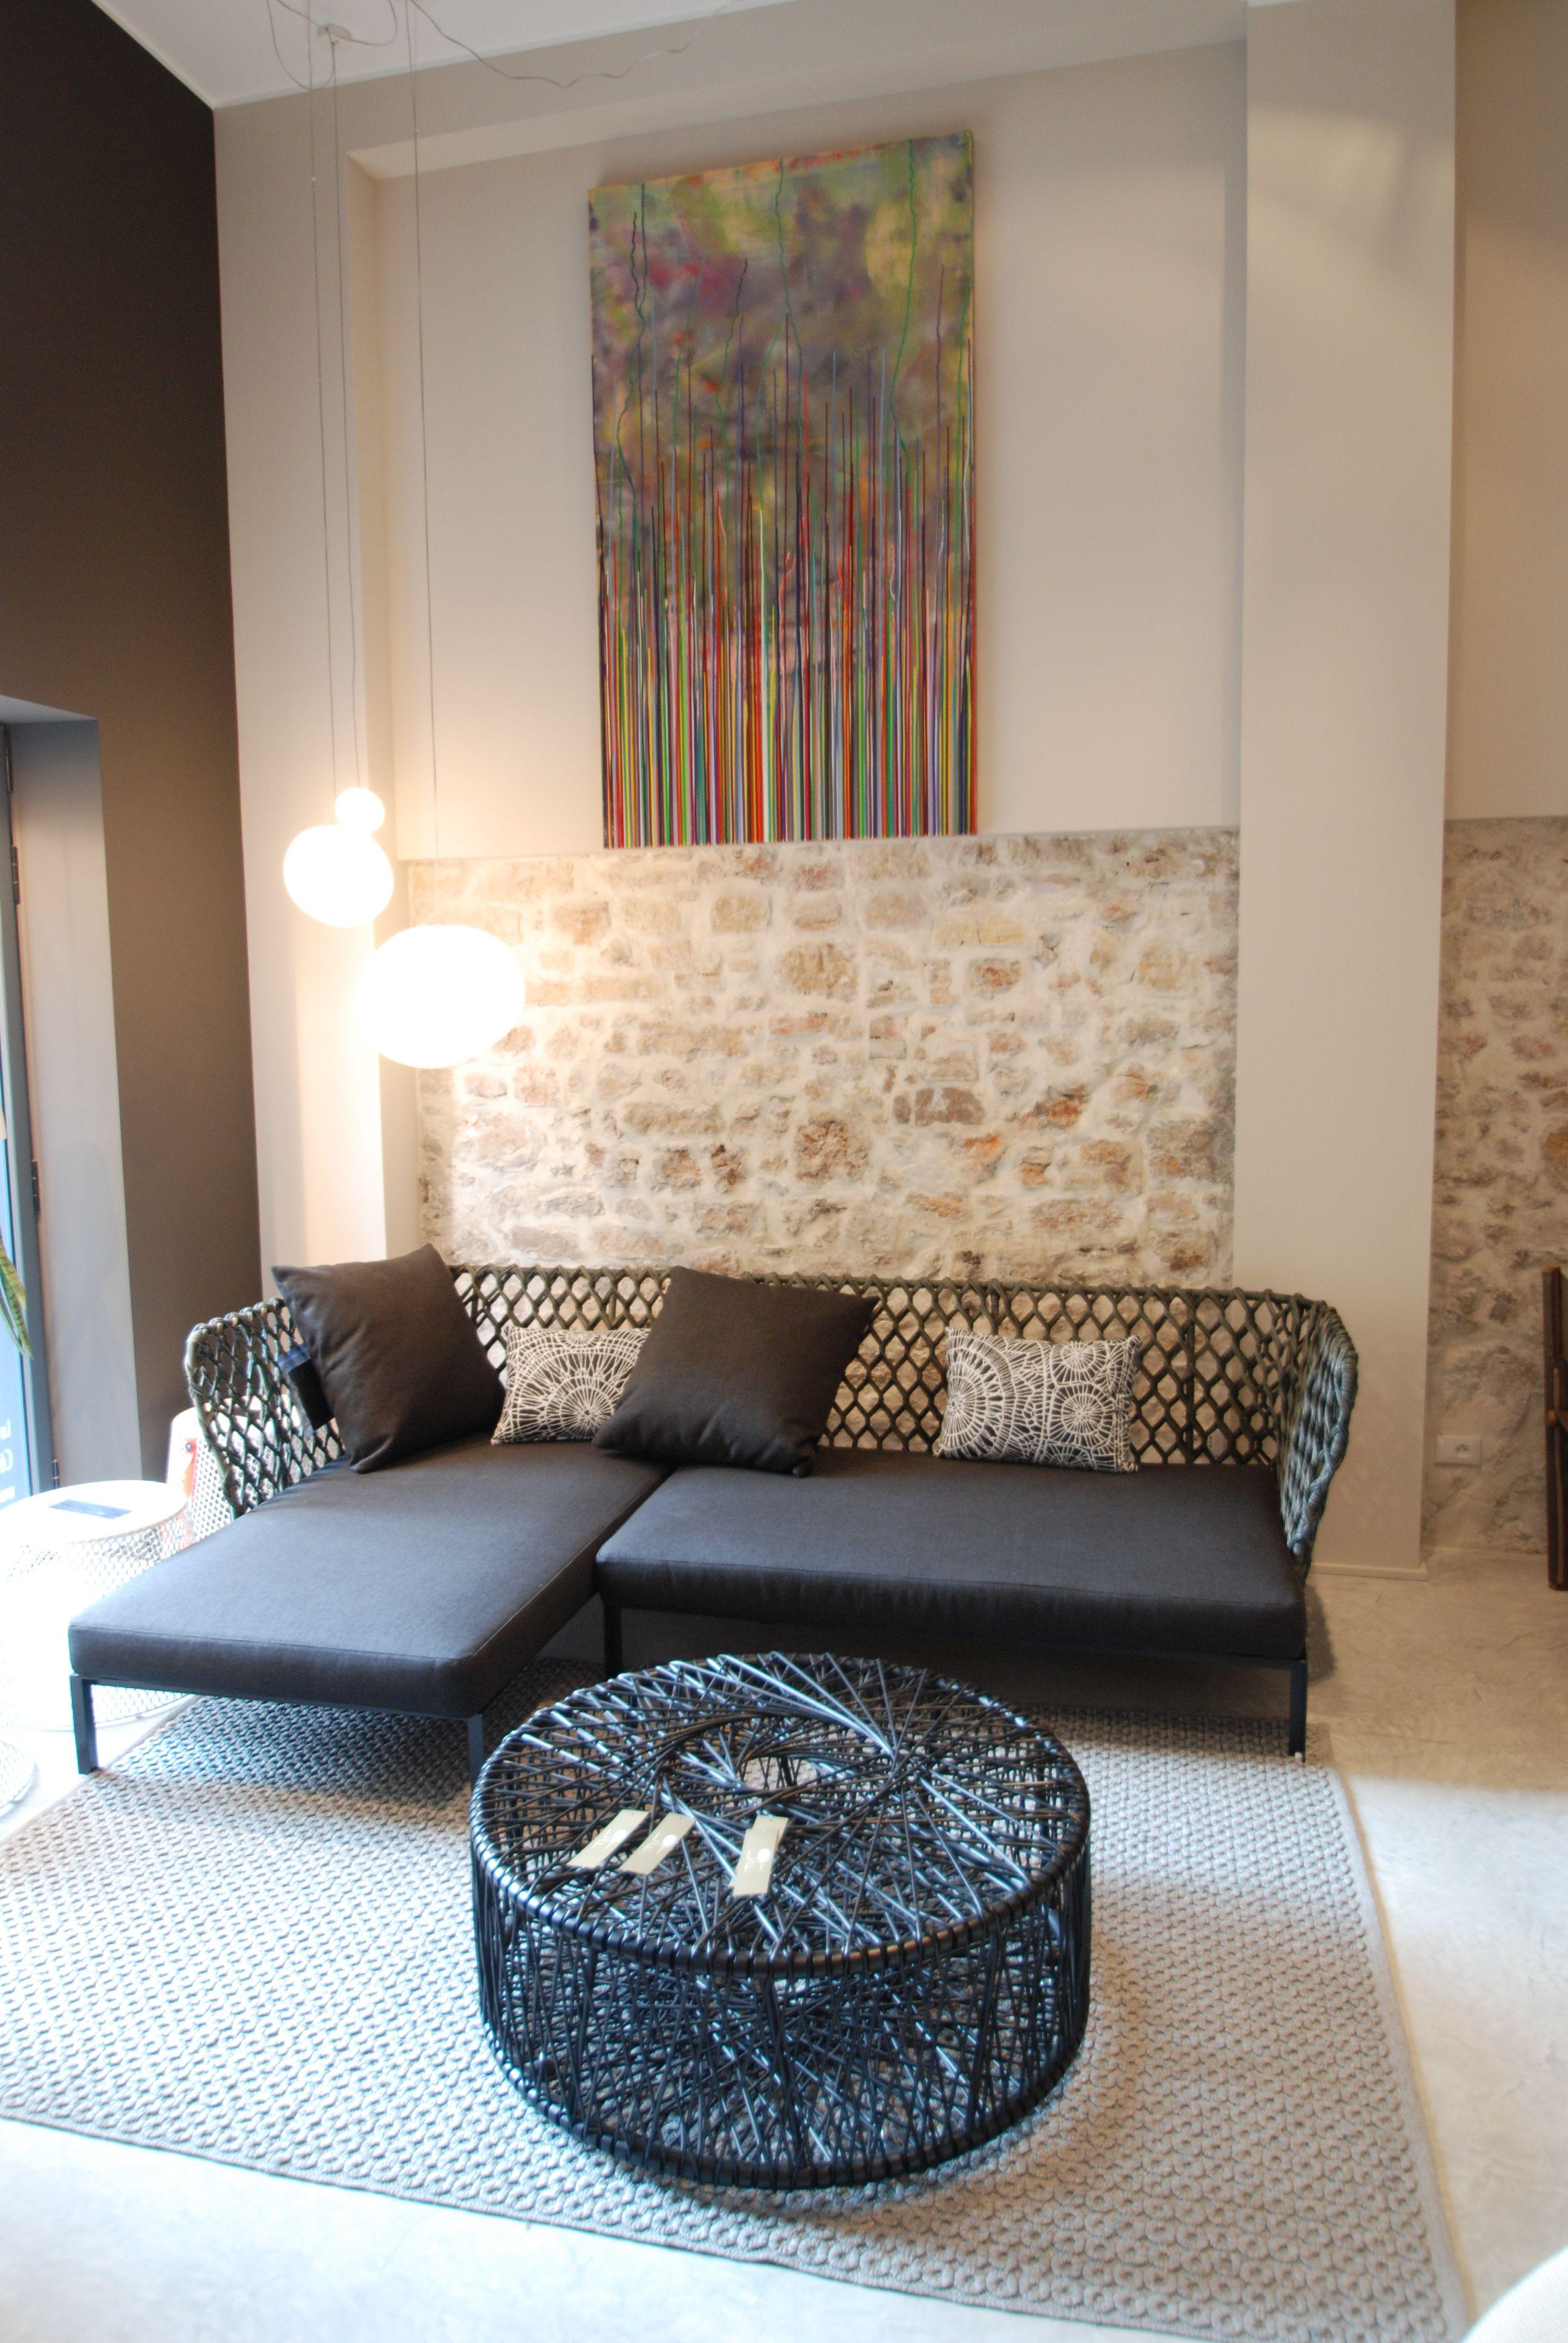 canap ravel b b outdoor dim 258x159cm 8320 eco taxe solde emport ttc 4160 00 50. Black Bedroom Furniture Sets. Home Design Ideas